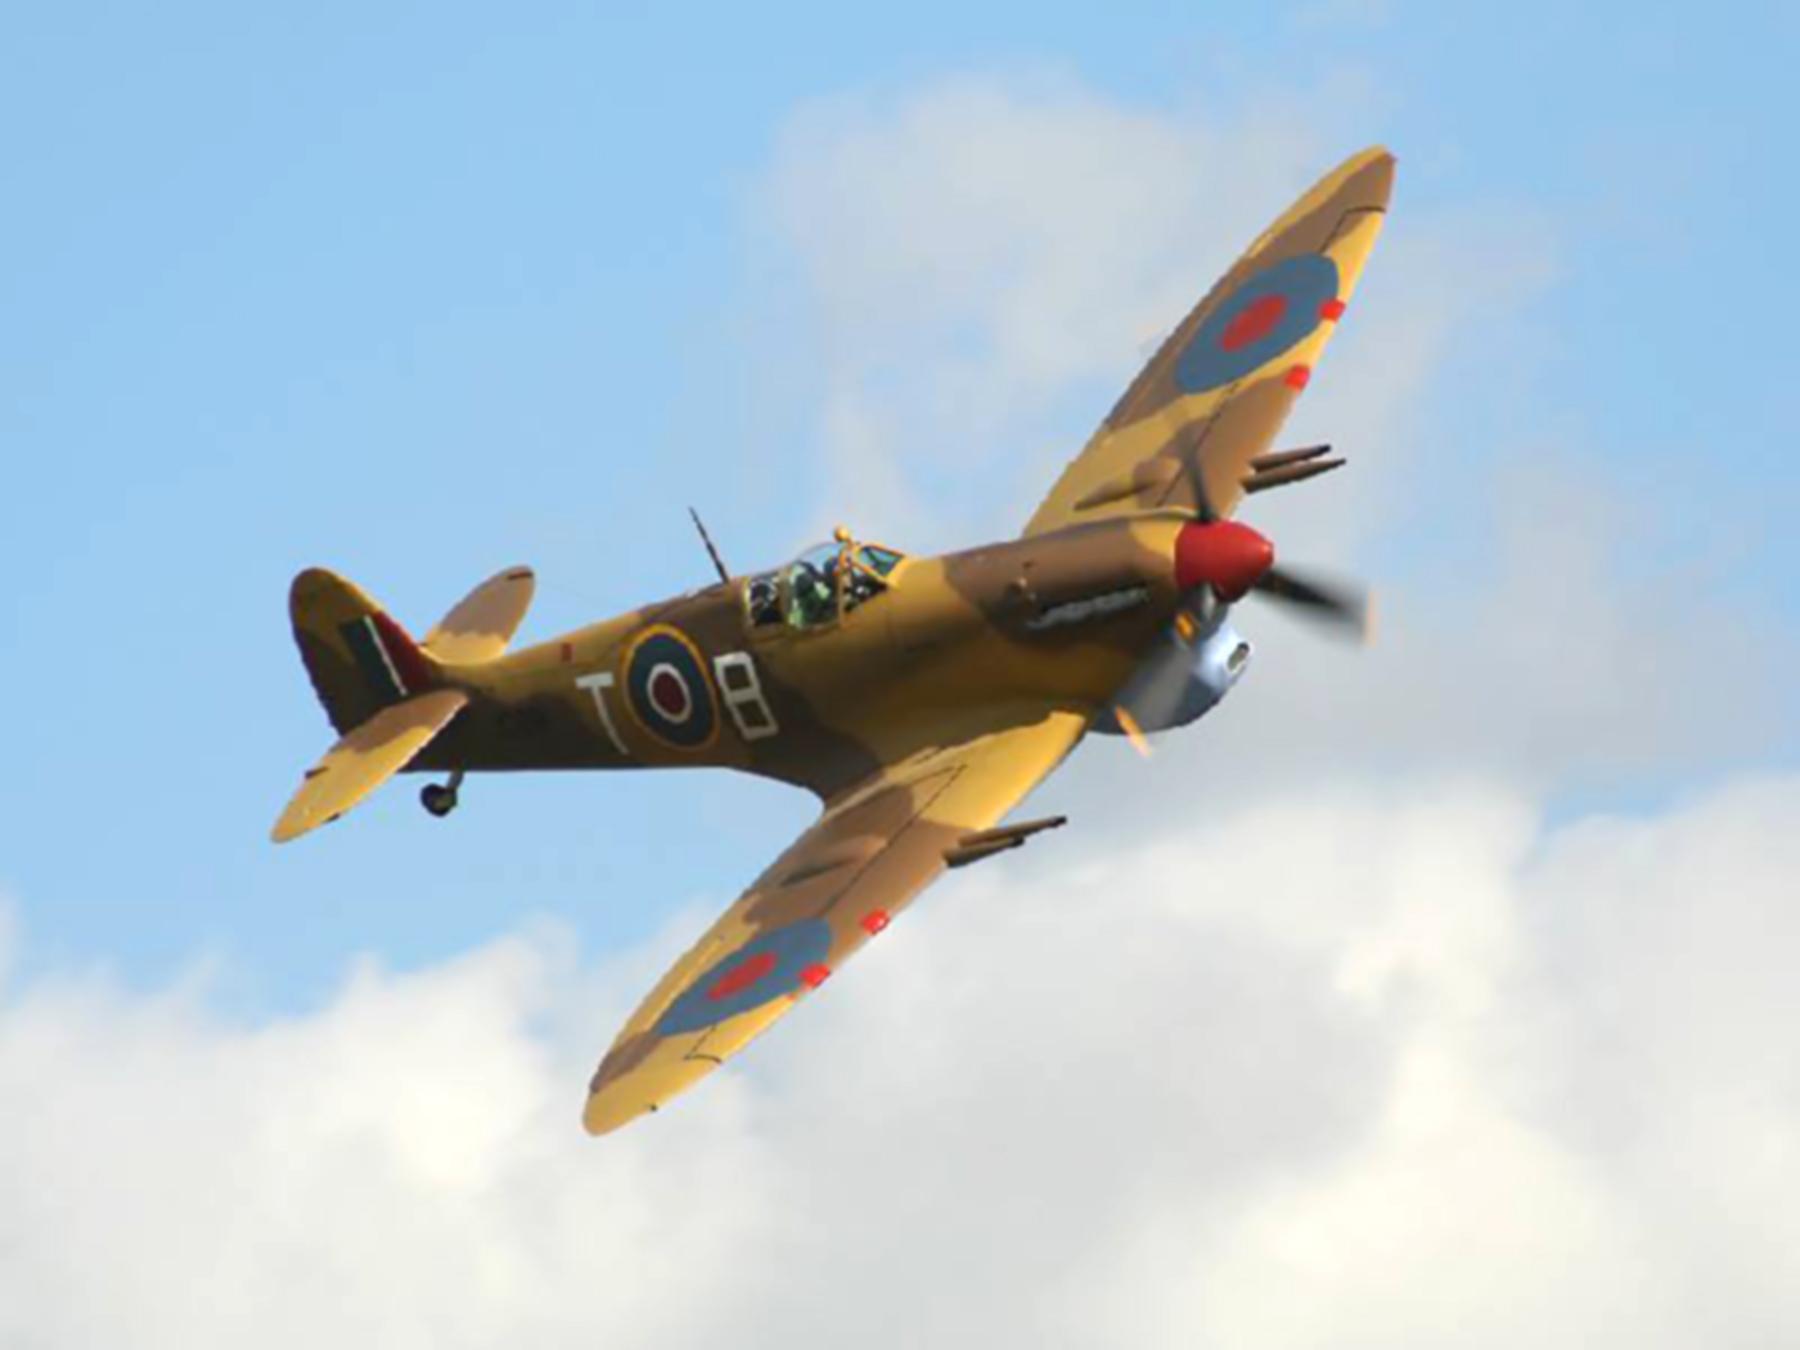 Airworthy Spitfire warbird MkVc Trop 249Sqn TB Jack Hughes JK879 01